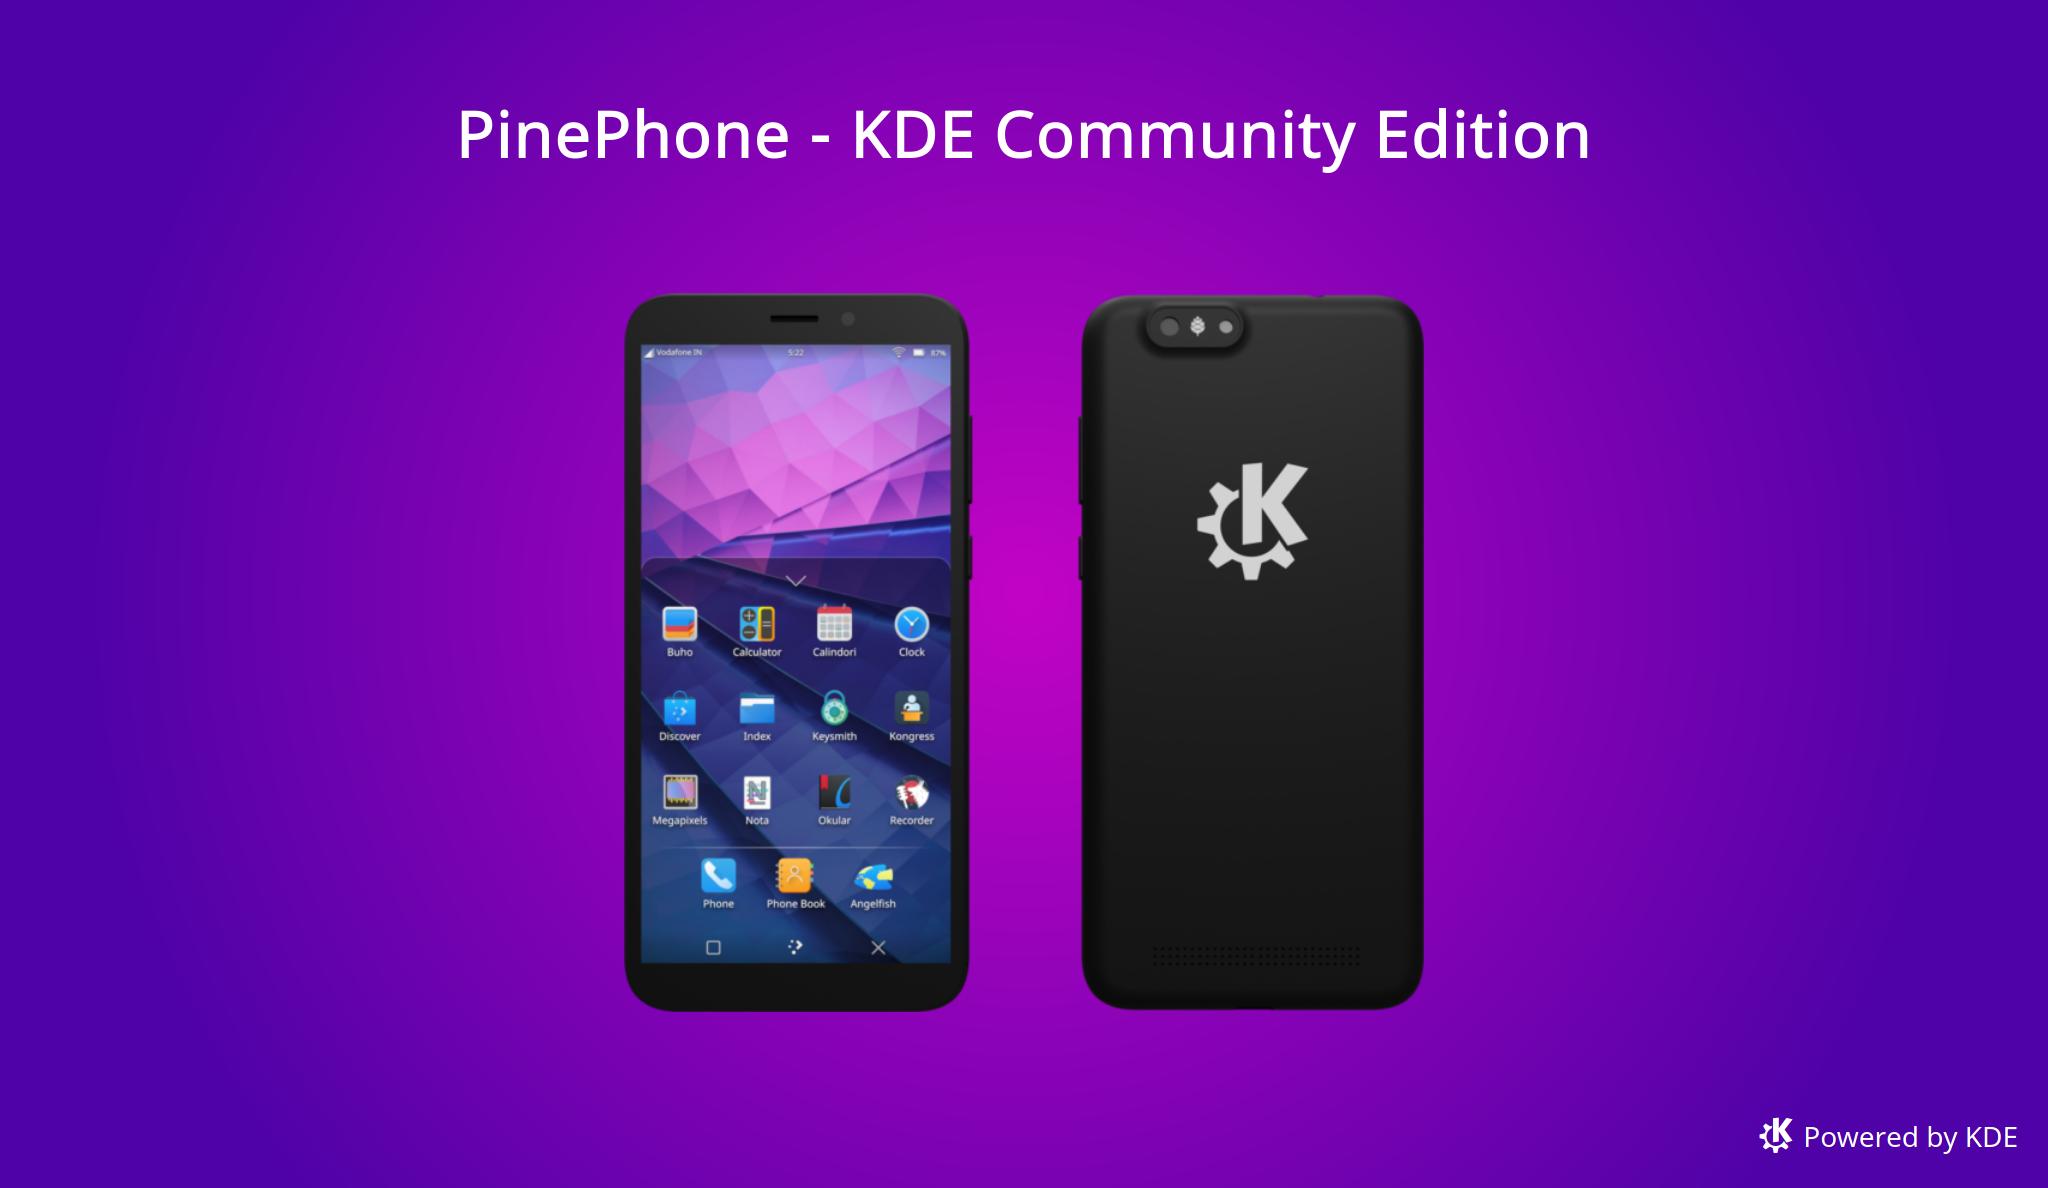 PinePhone - KDE Community Edition